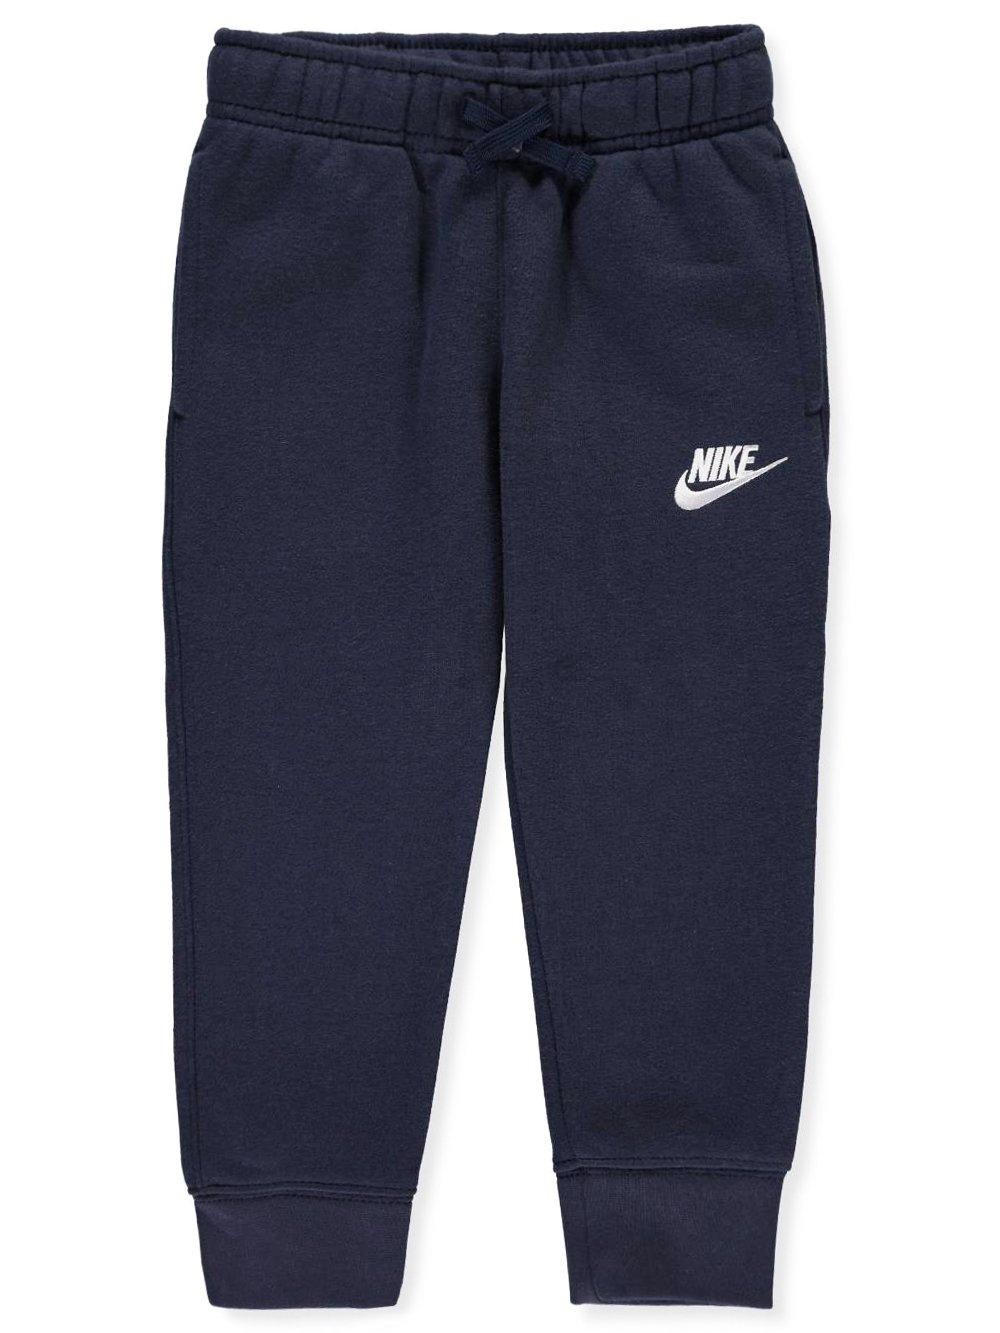 Nike Little Boys Fleece Jogger Pants (Sizes 4 - 7) -Obsidian, 6